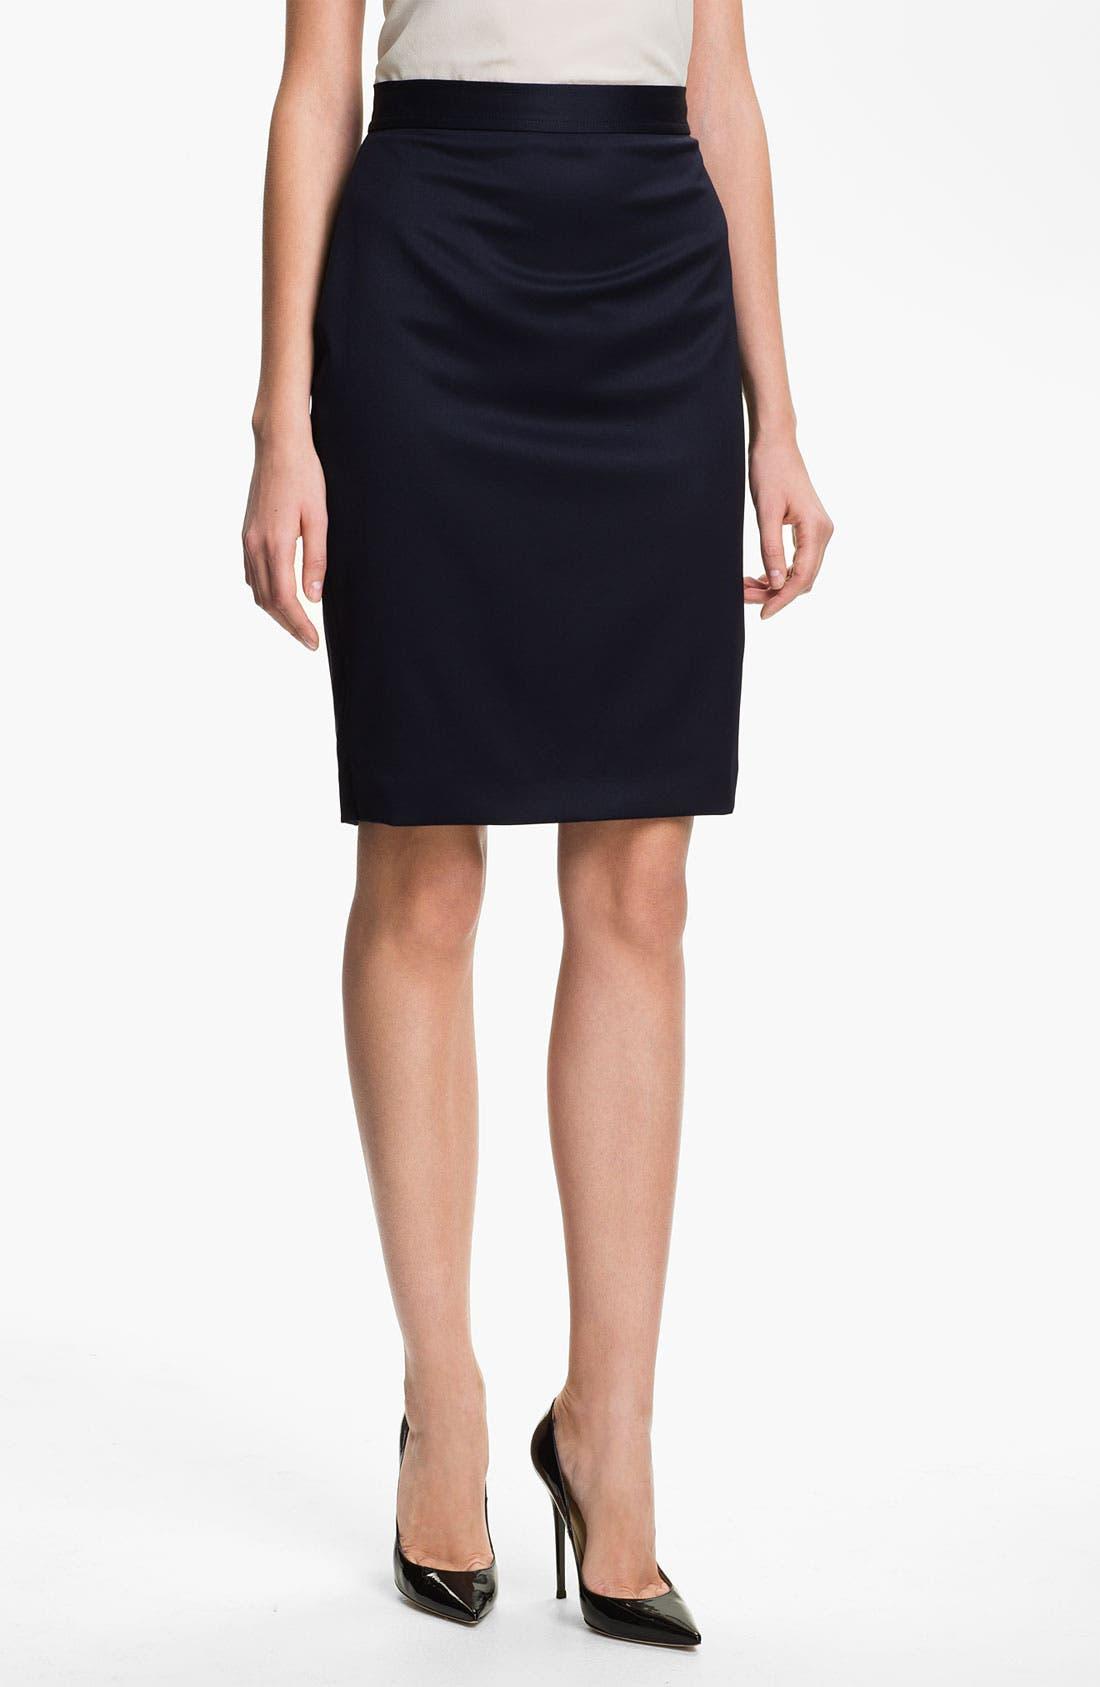 Alternate Image 1 Selected - St. John Collection Venetian Wool Pencil Skirt